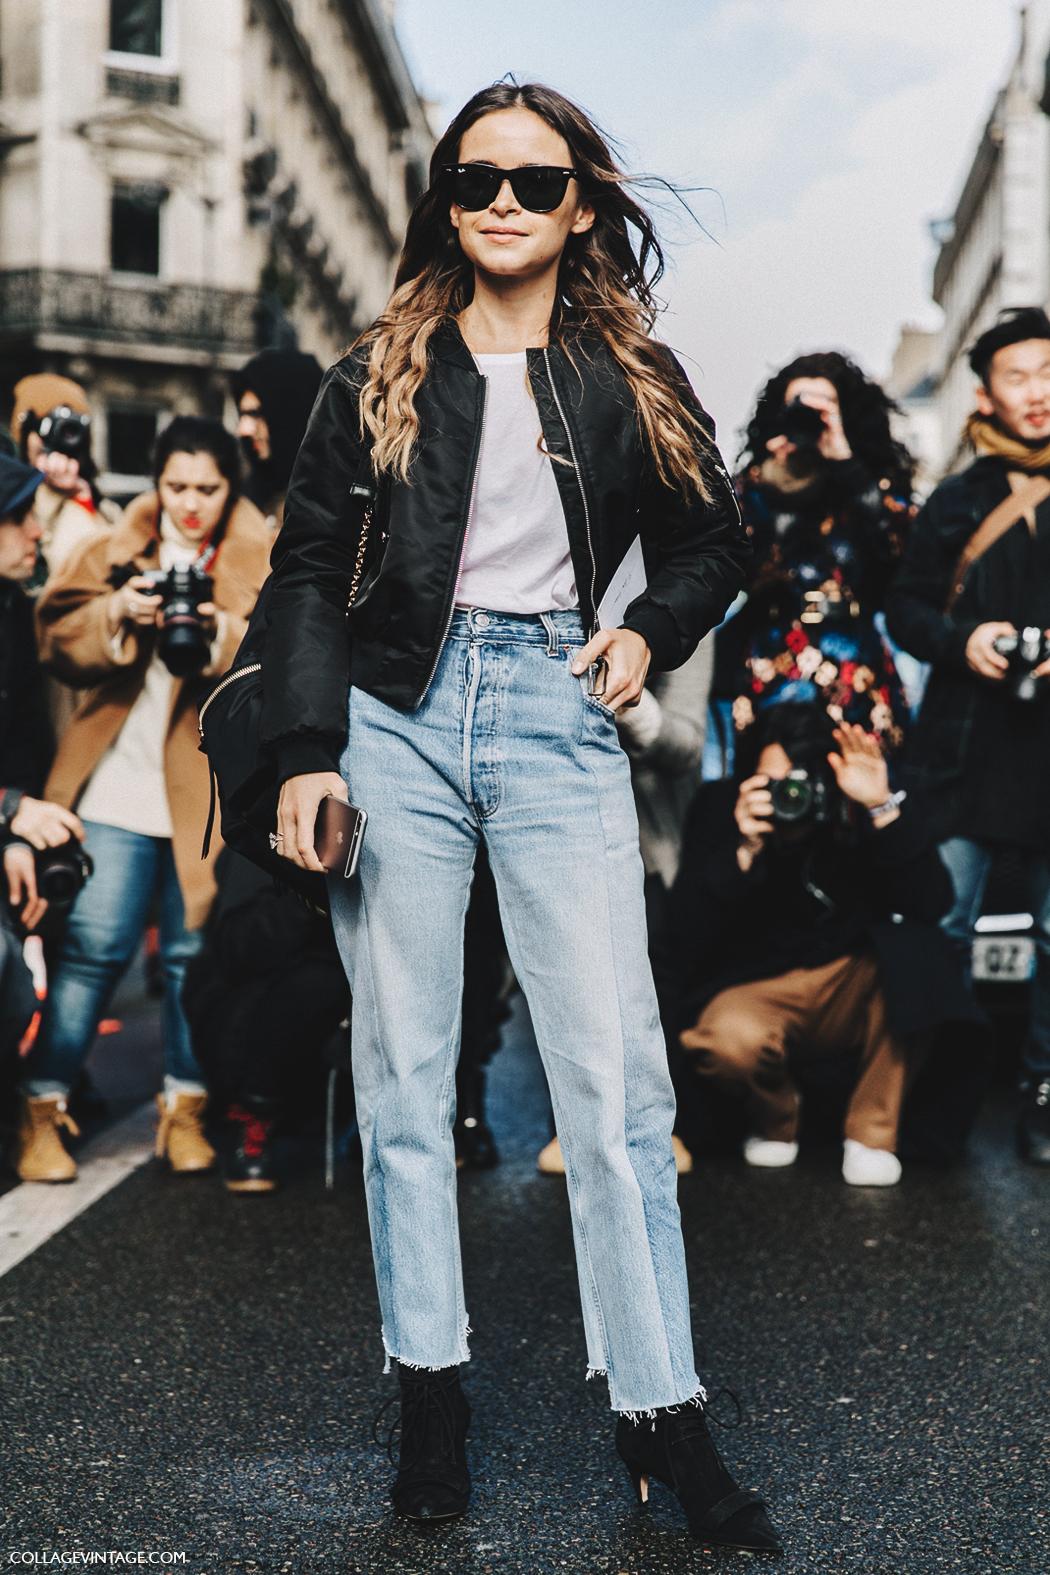 PFW-Paris_Fashion_Week_Fall_2016-Street_Style-Collage_Vintage-Miroslava_Duma-Vetements-Jeans-Backpack-Bomber-6